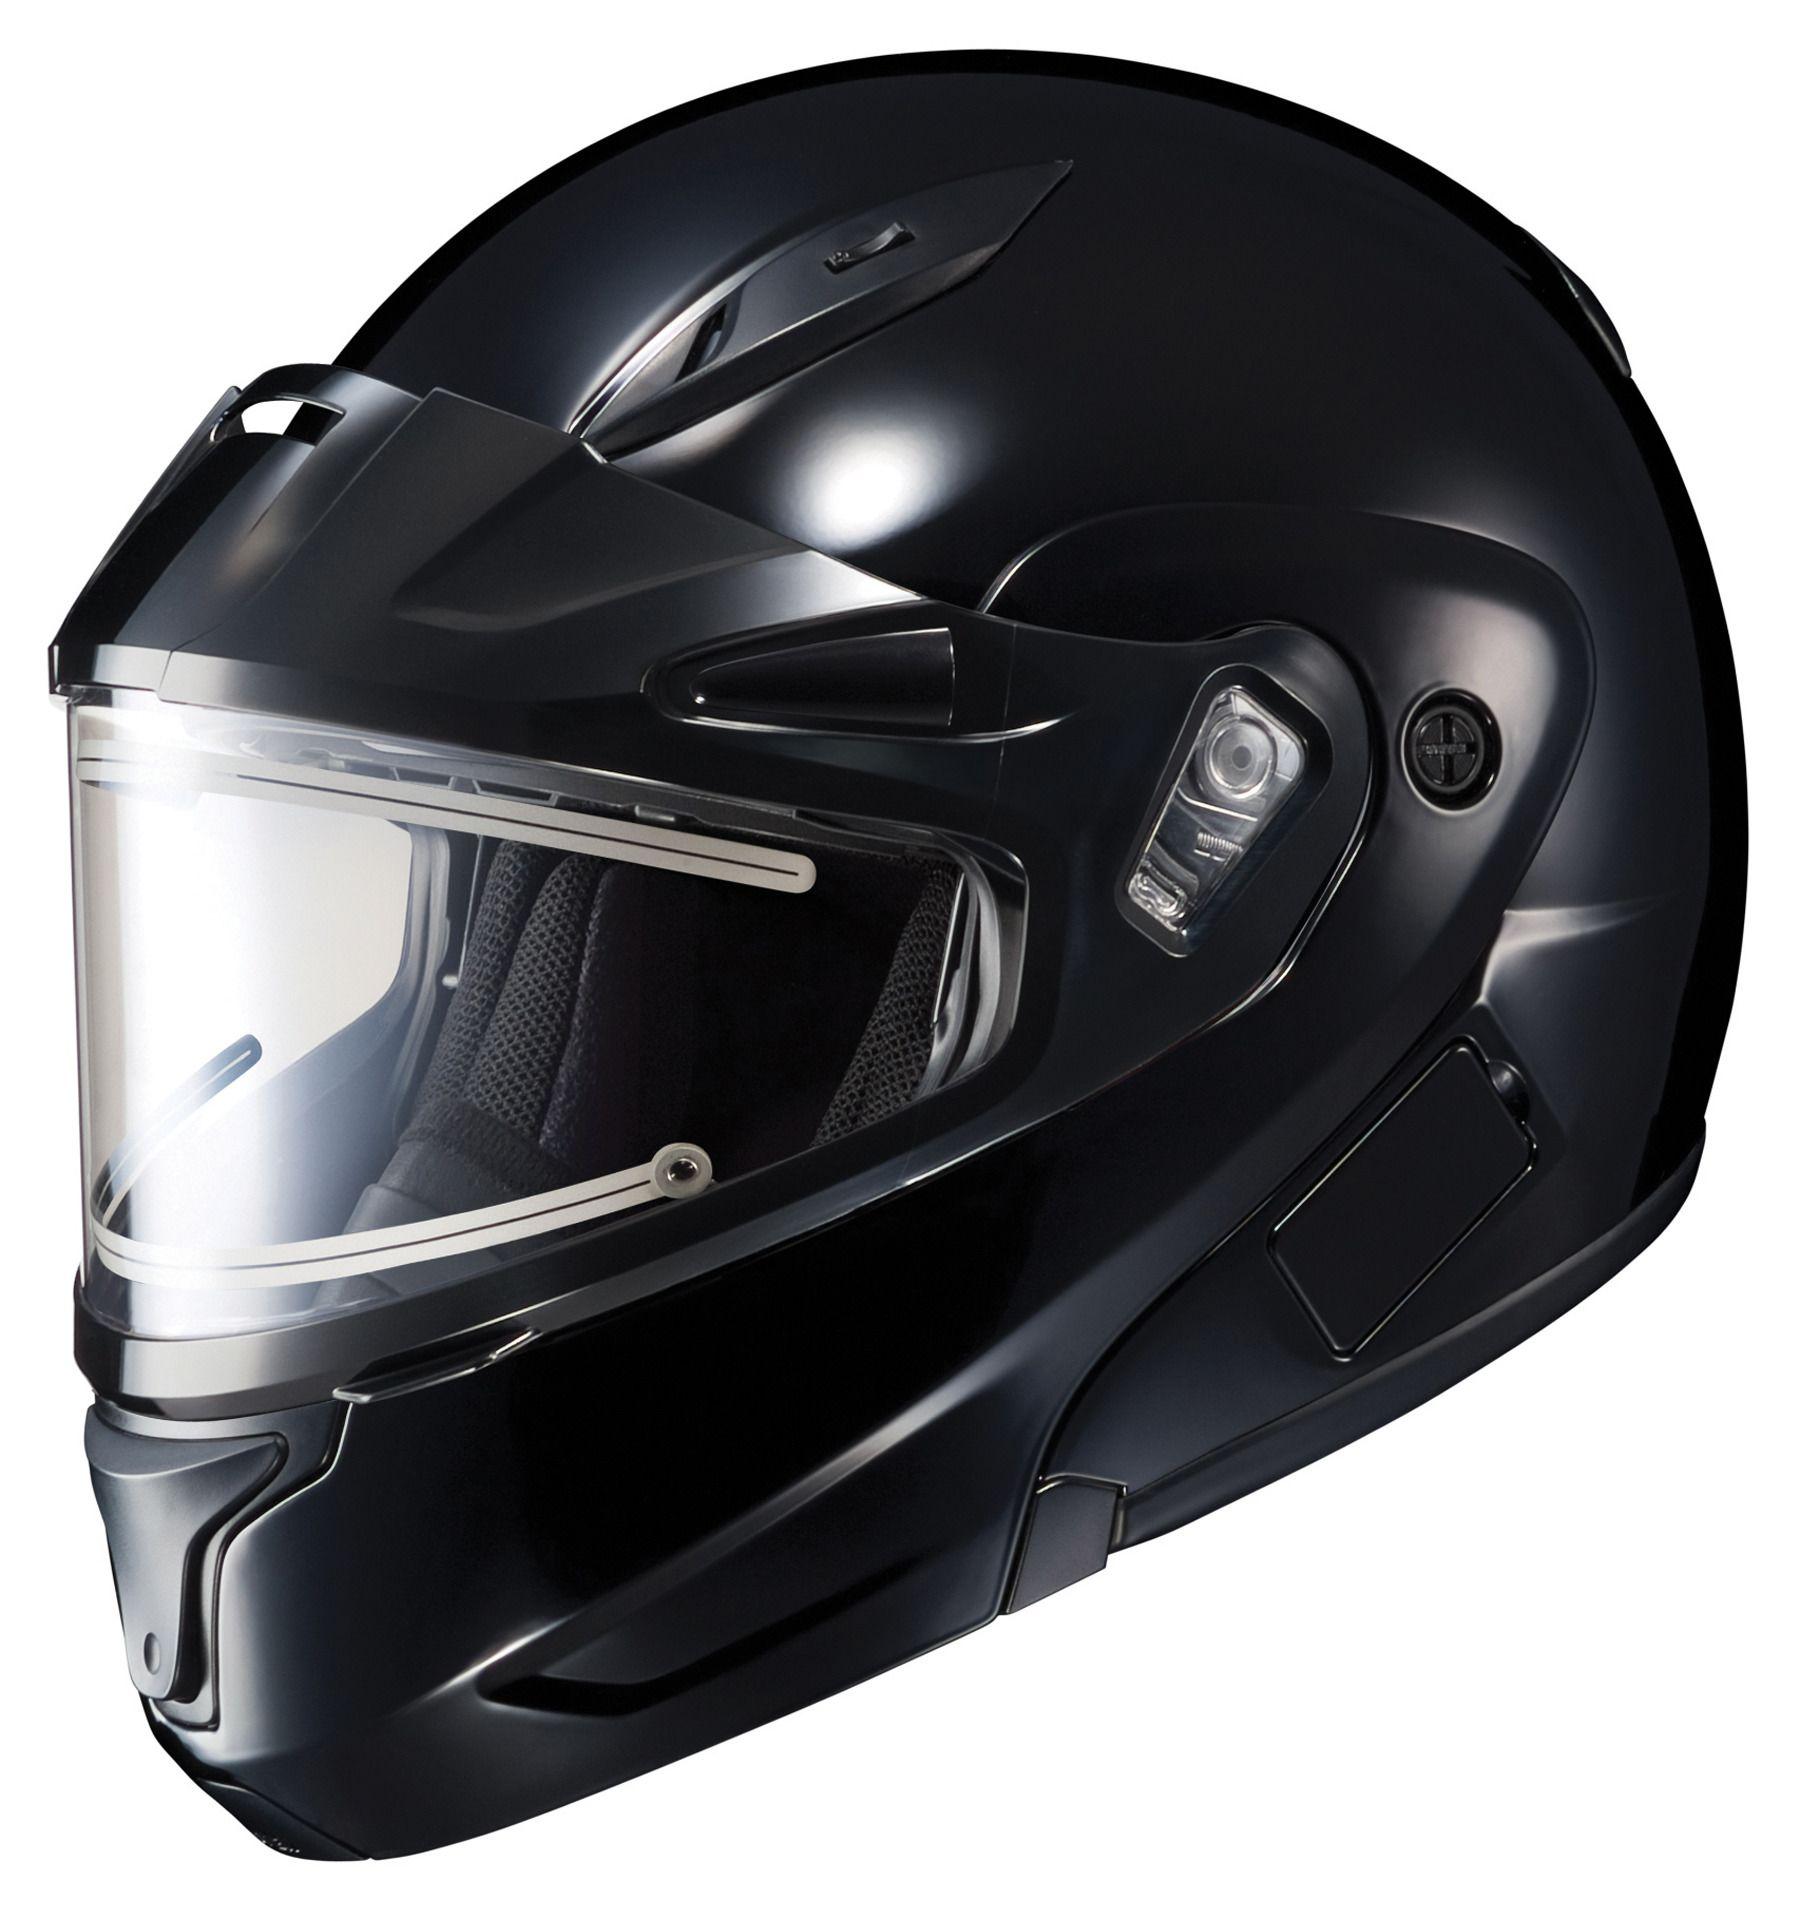 Yamaha Dual Sport >> HJC CL-Max 2 BT Snow Helmet - Electric Shield | 20% ($48 ...